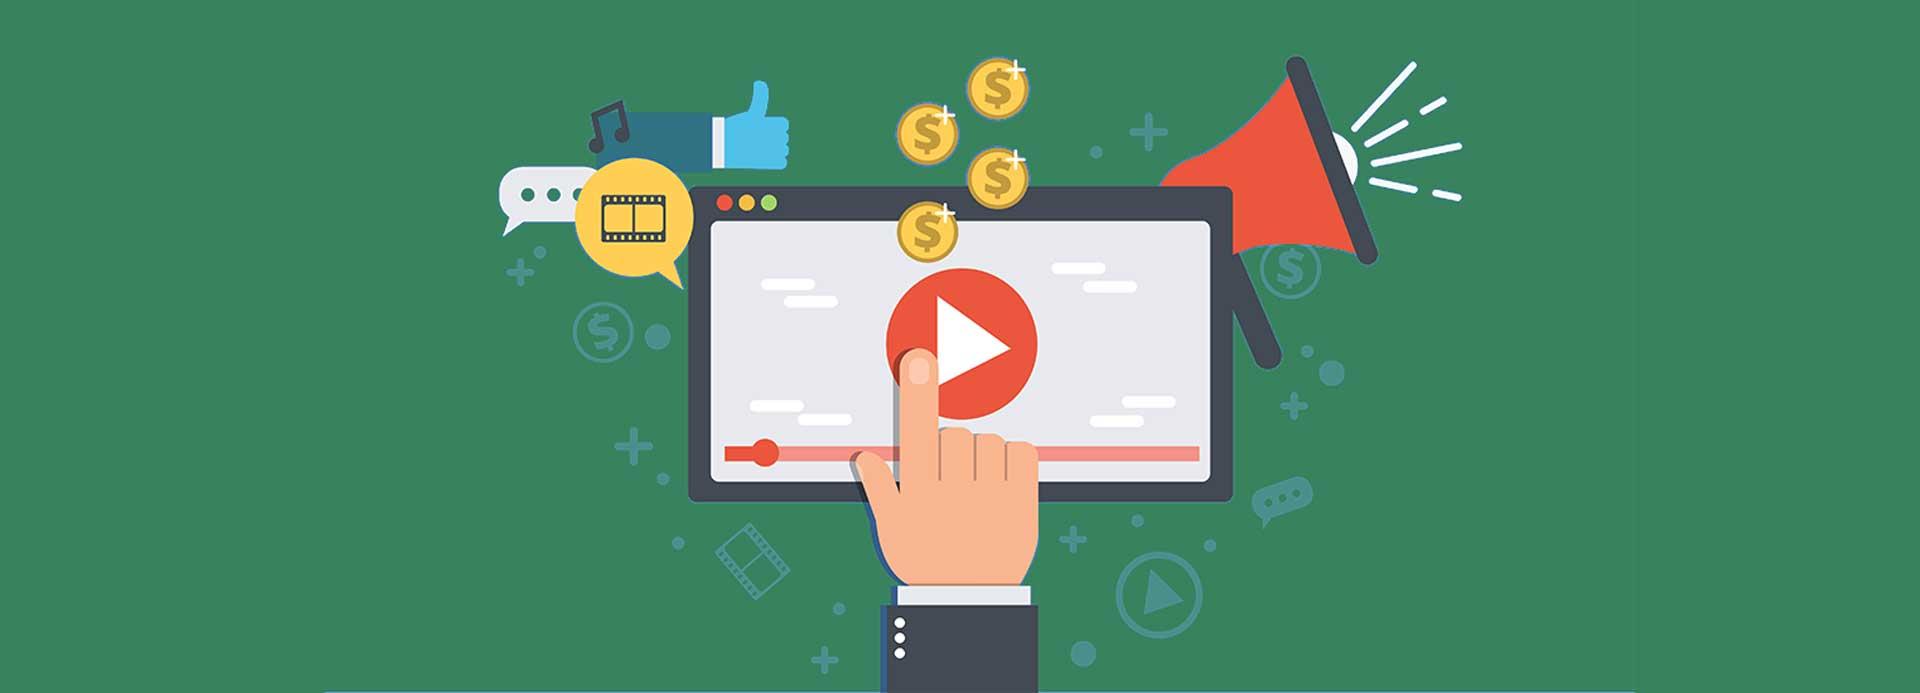 Brands using Video Marketing